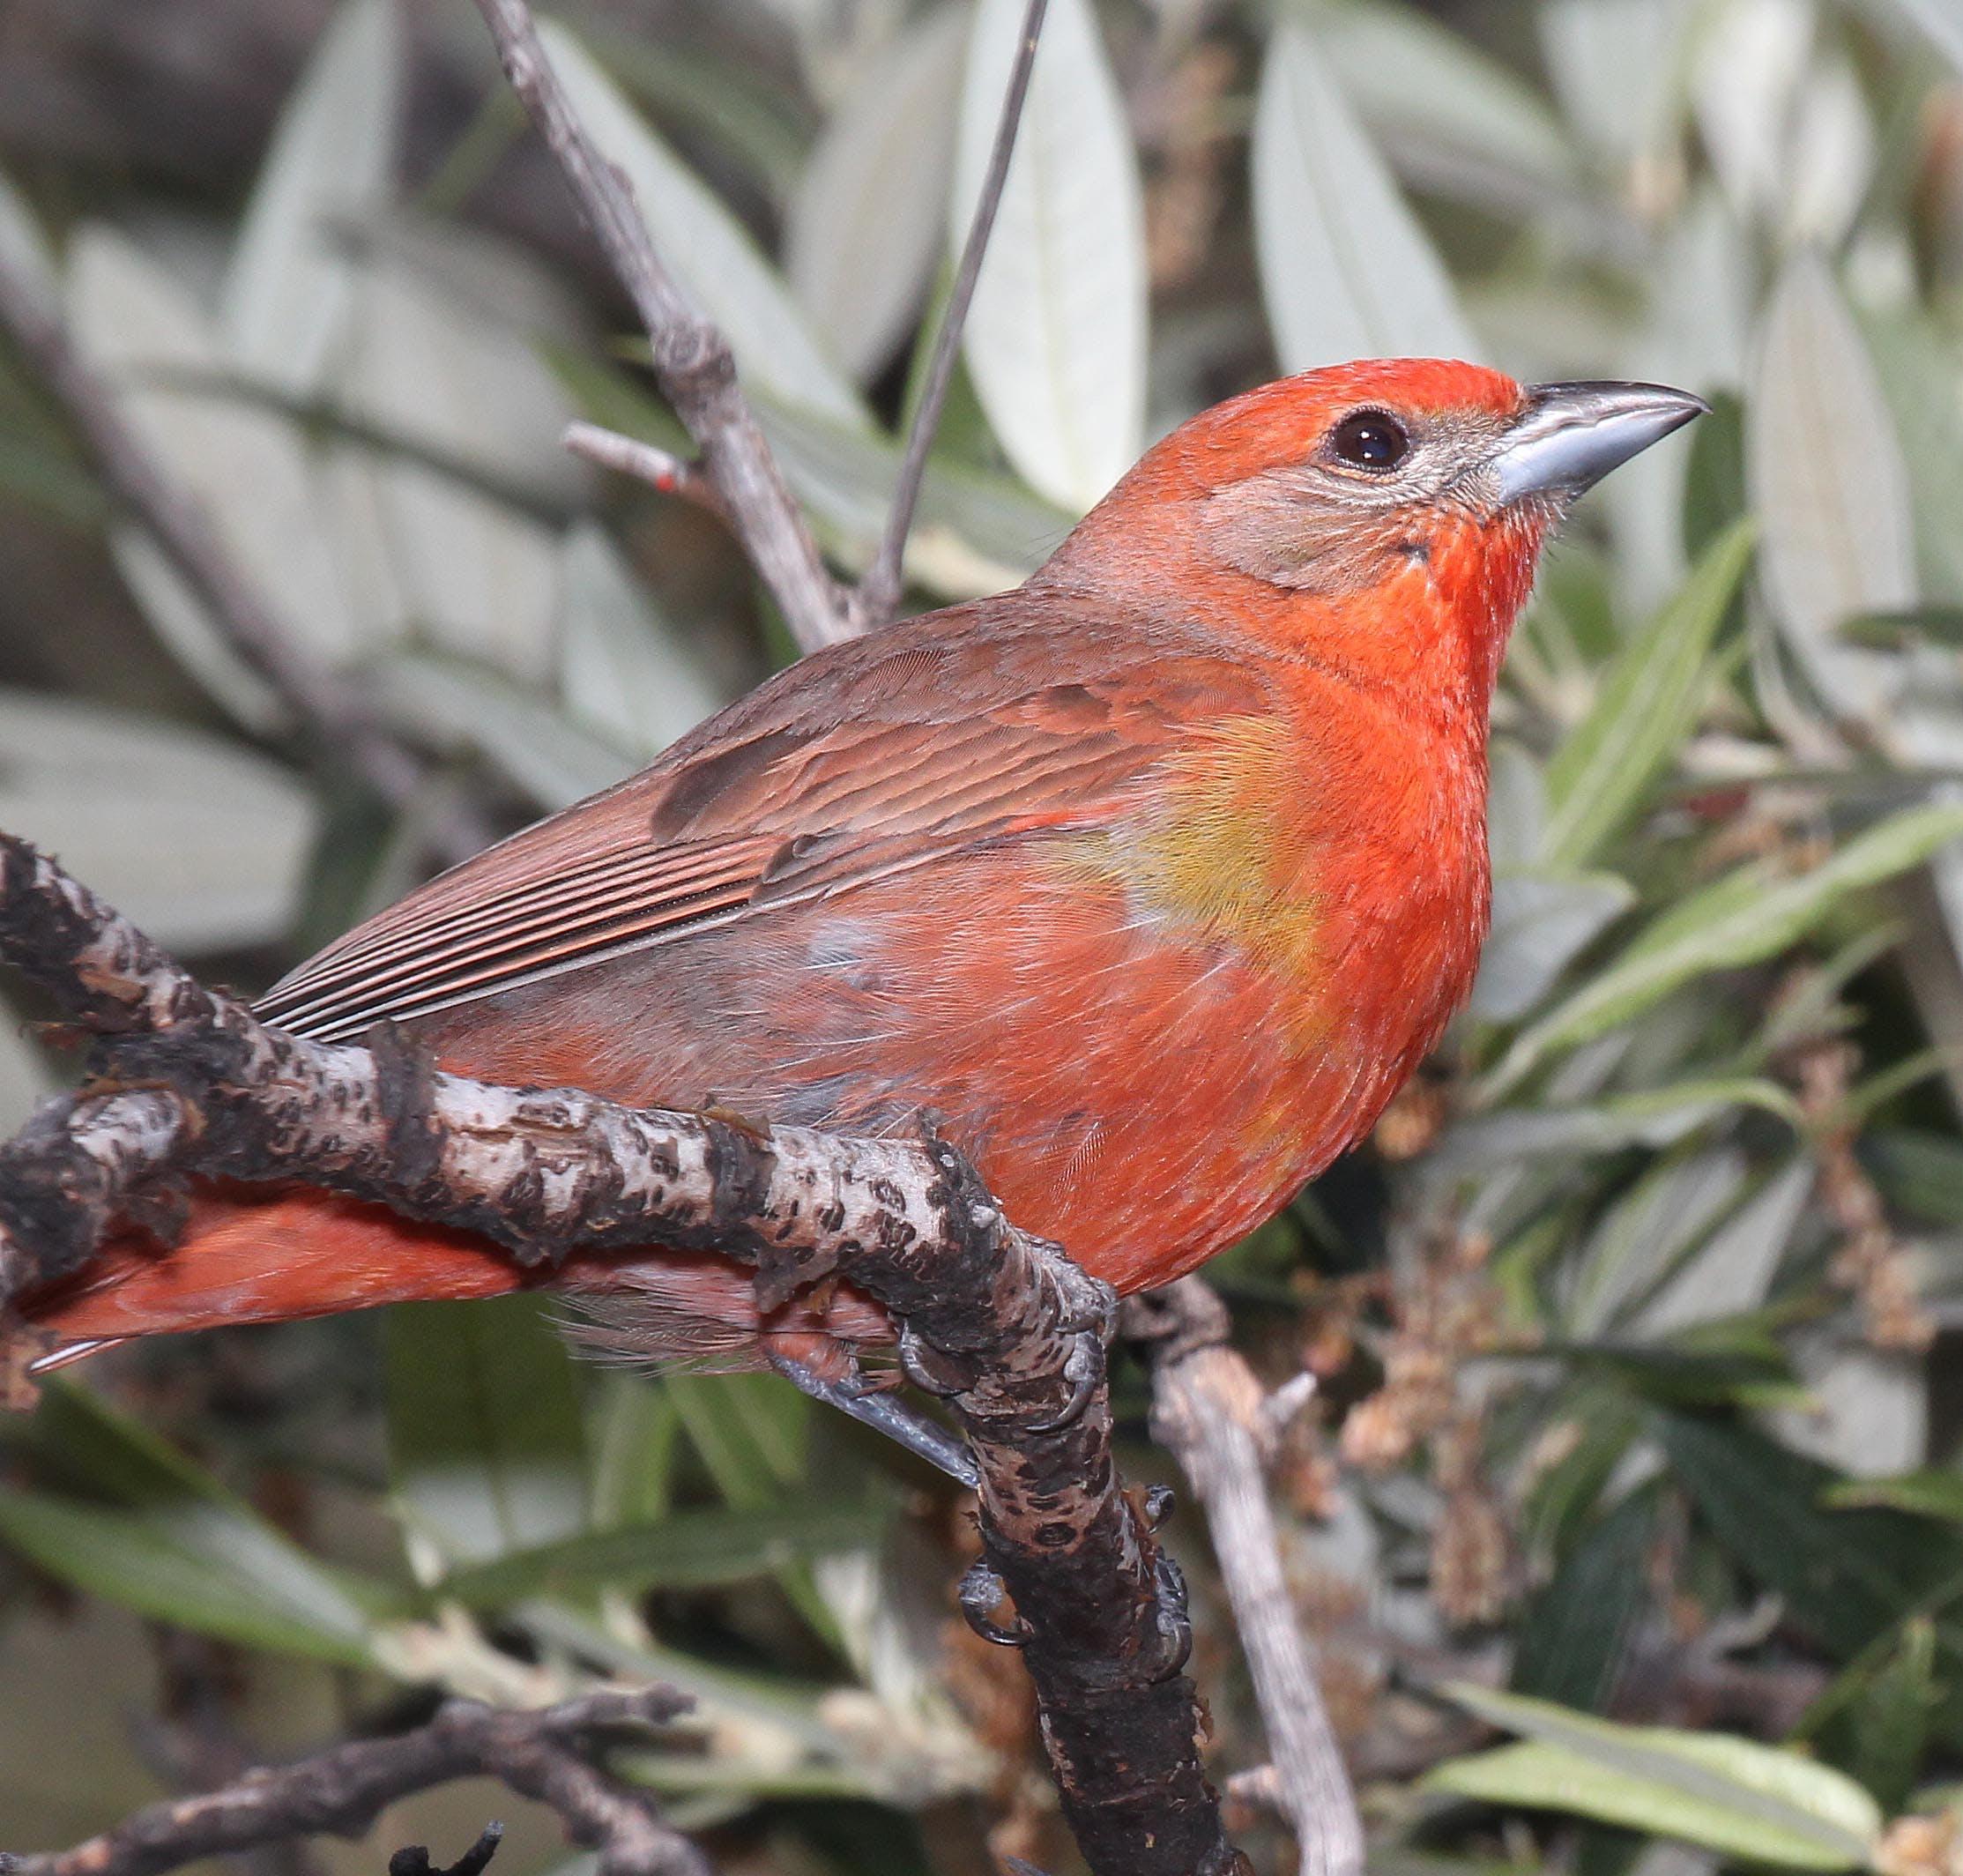 Orange Brown and Yellow Long Beaked Bird